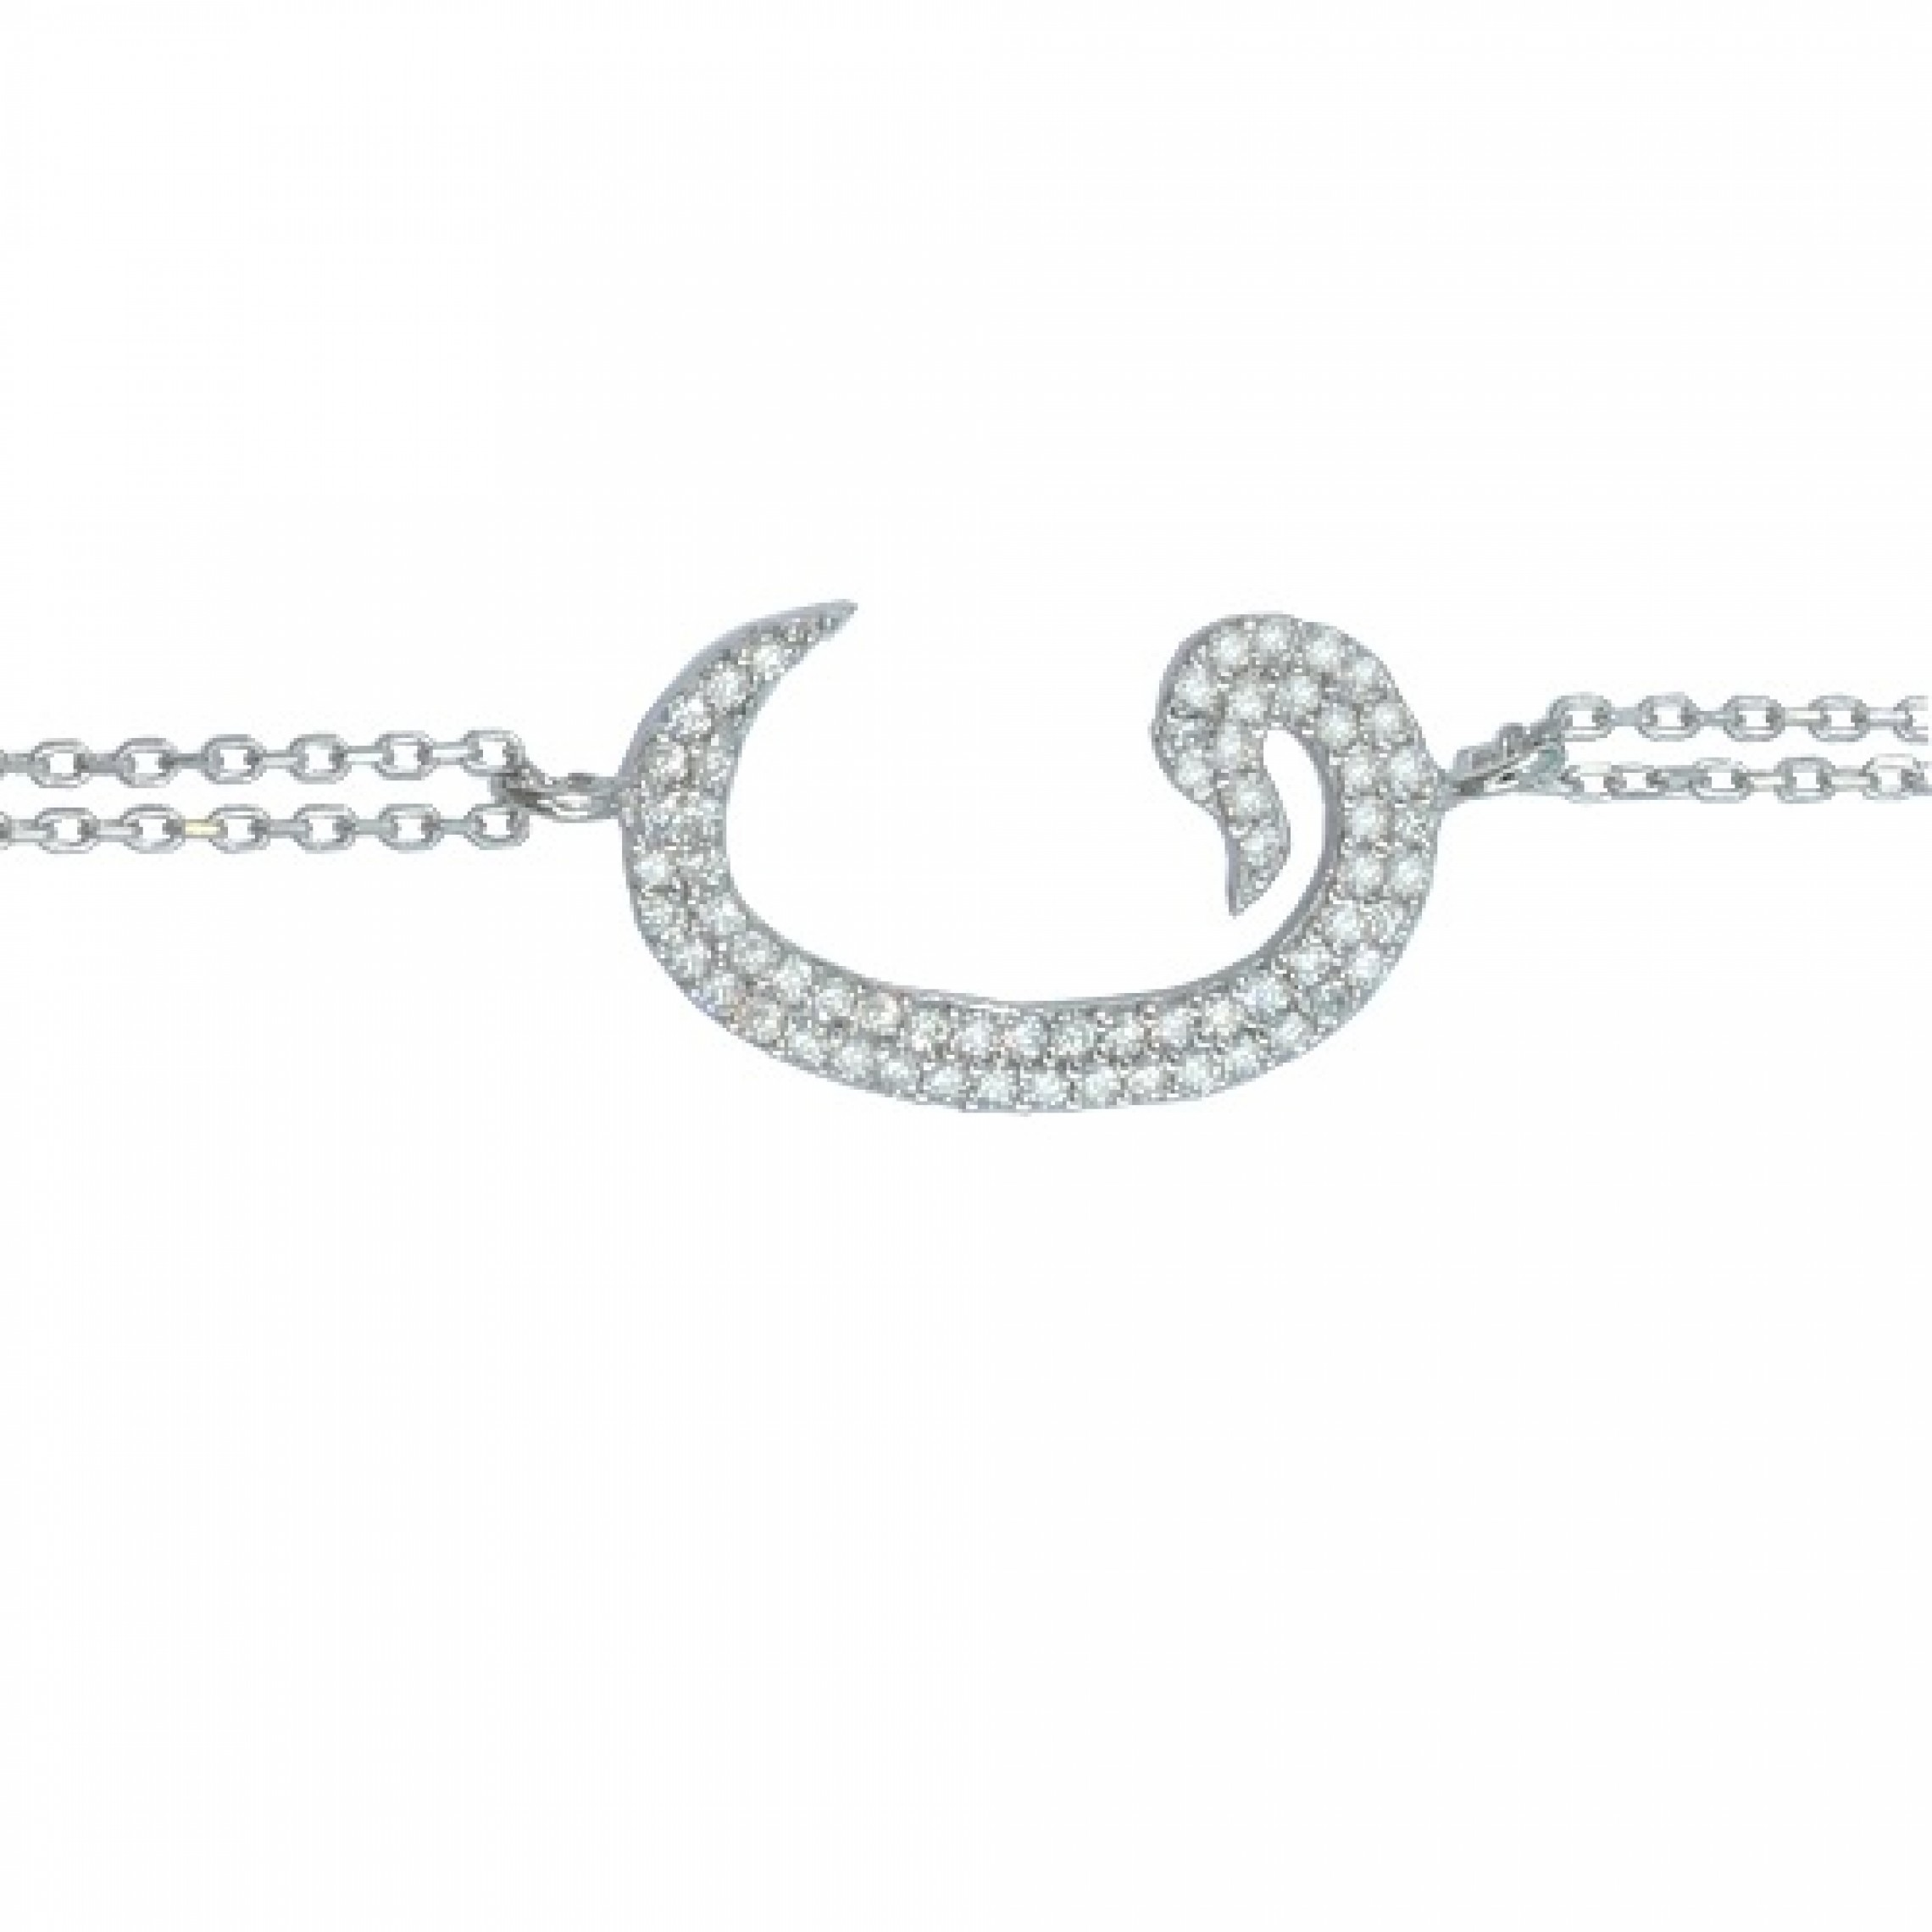 SB-164 Evil Eye 925 Sterling Silver CZ Bracelet